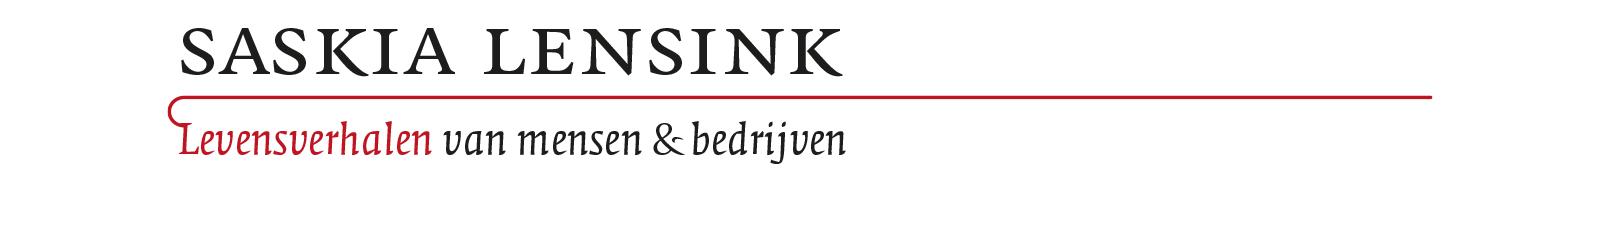 logo_saskialensink